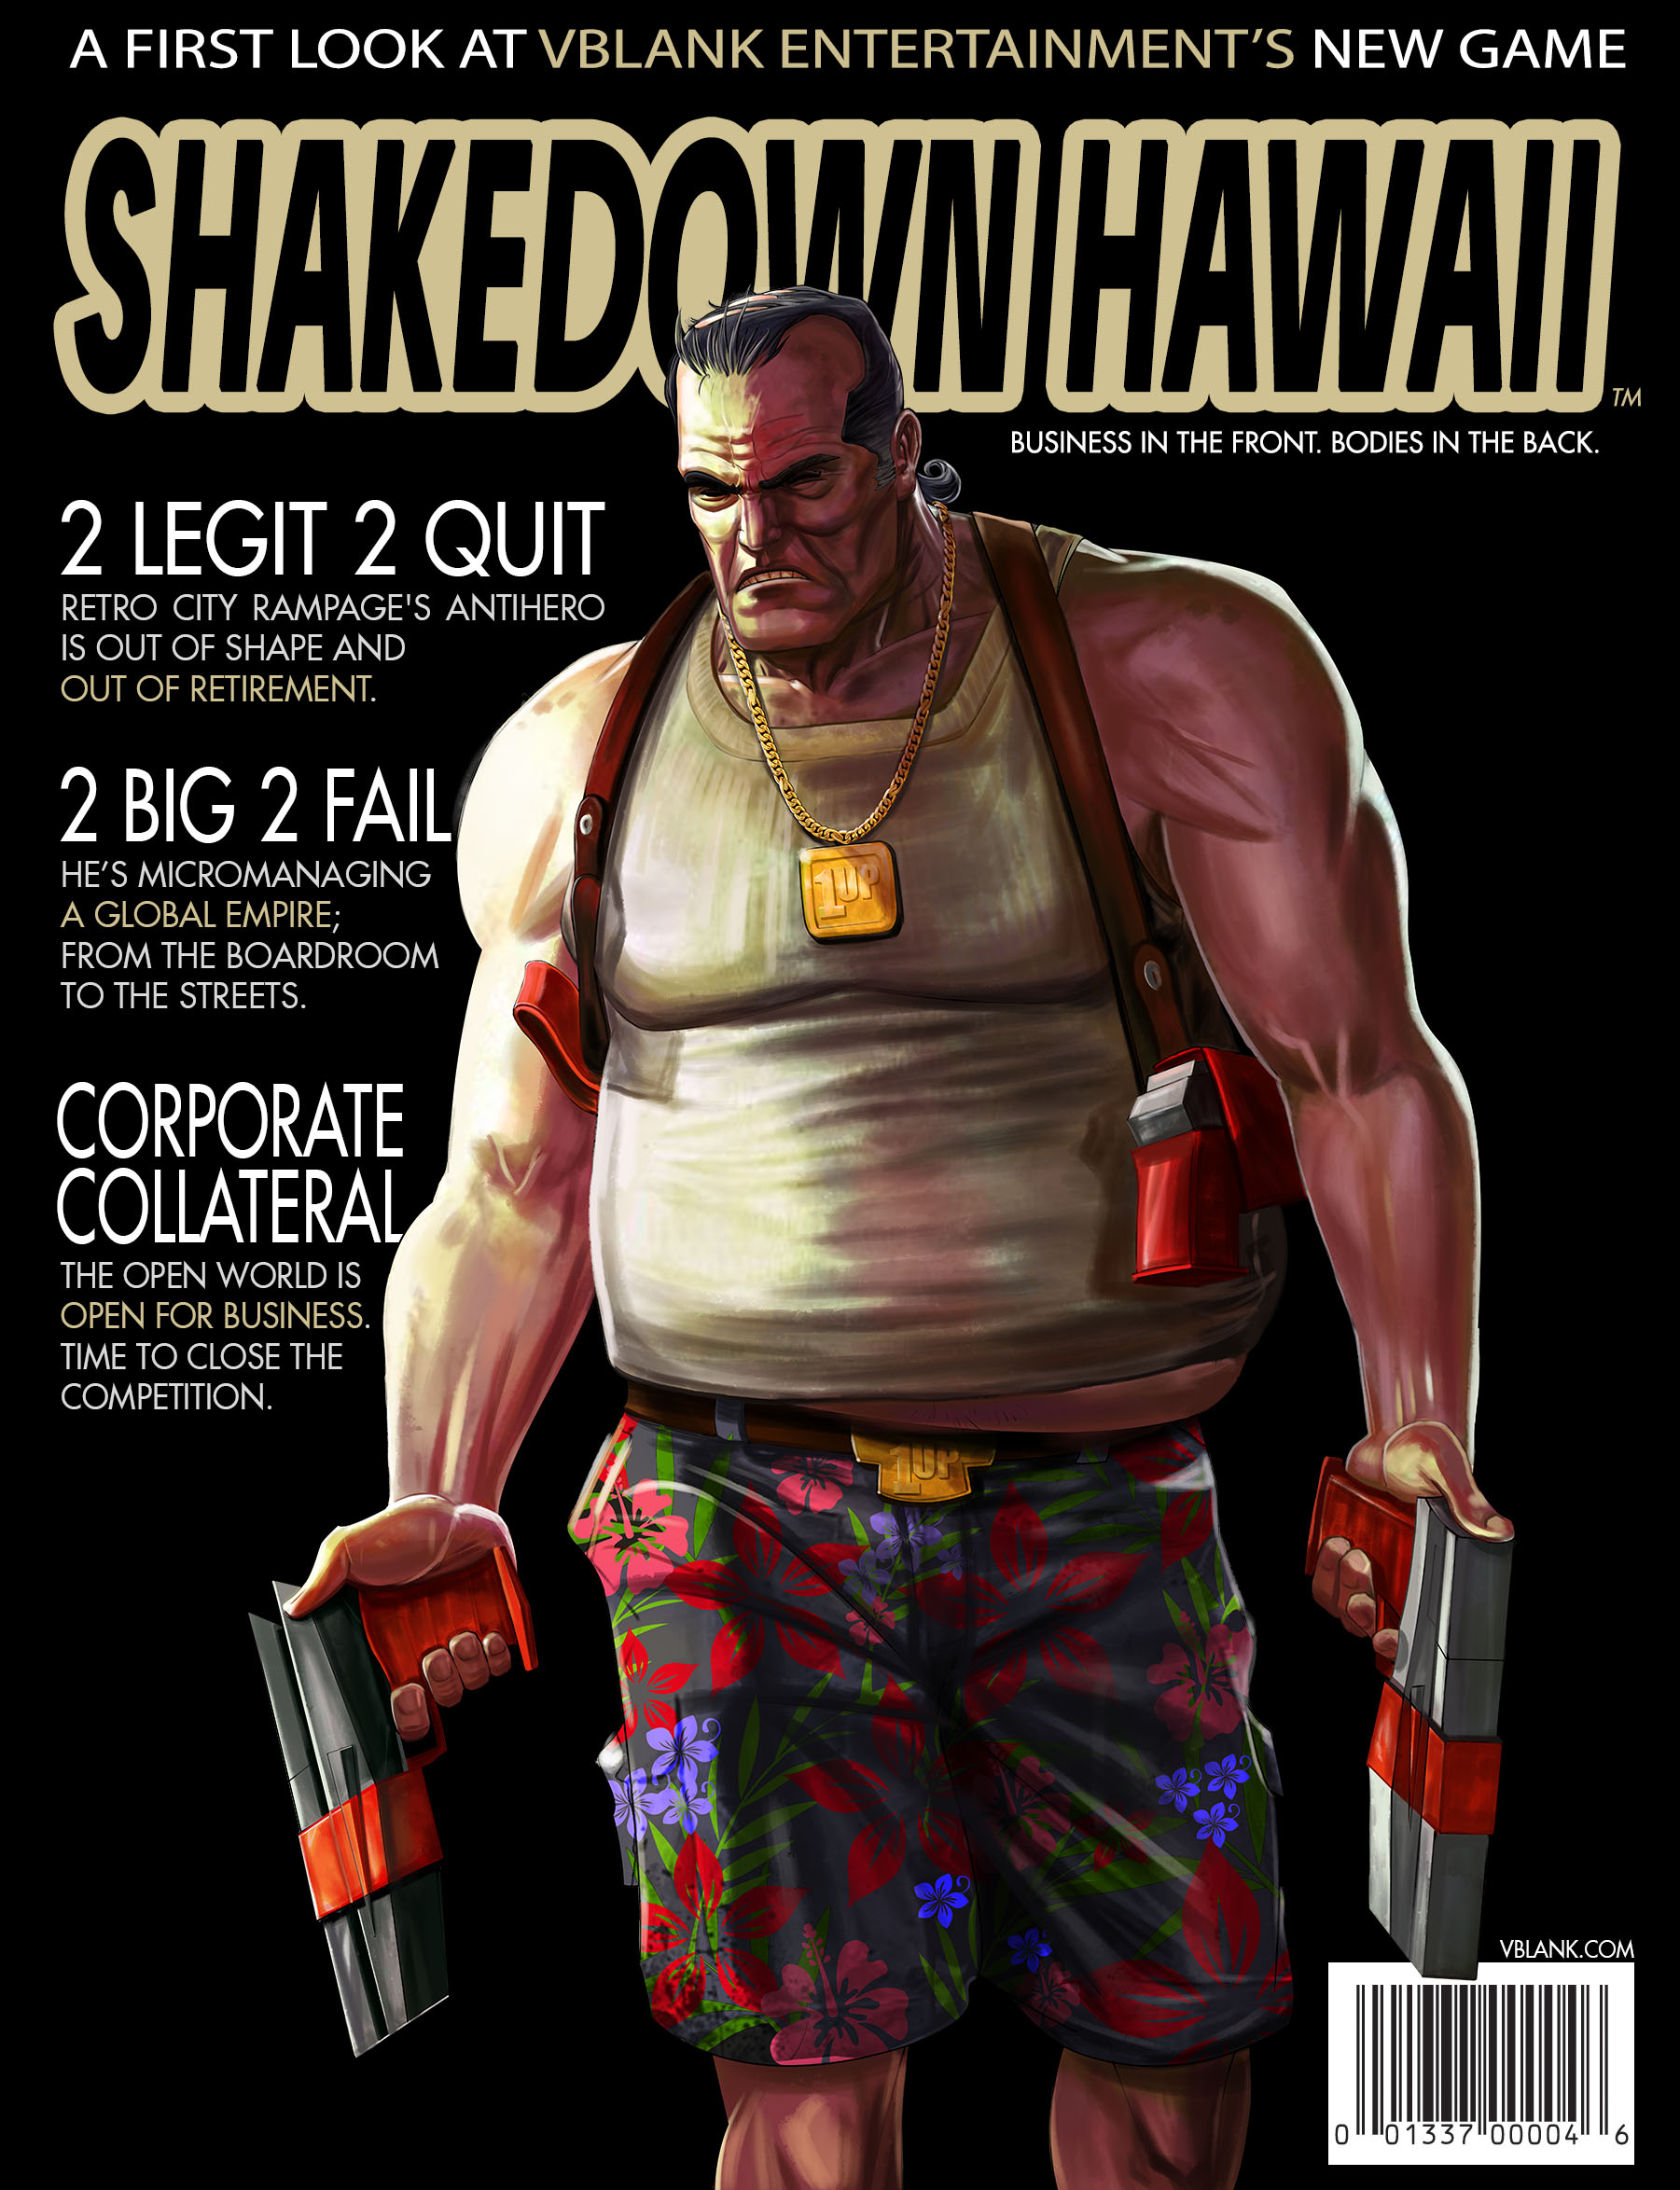 shakedown-hawaii-poster